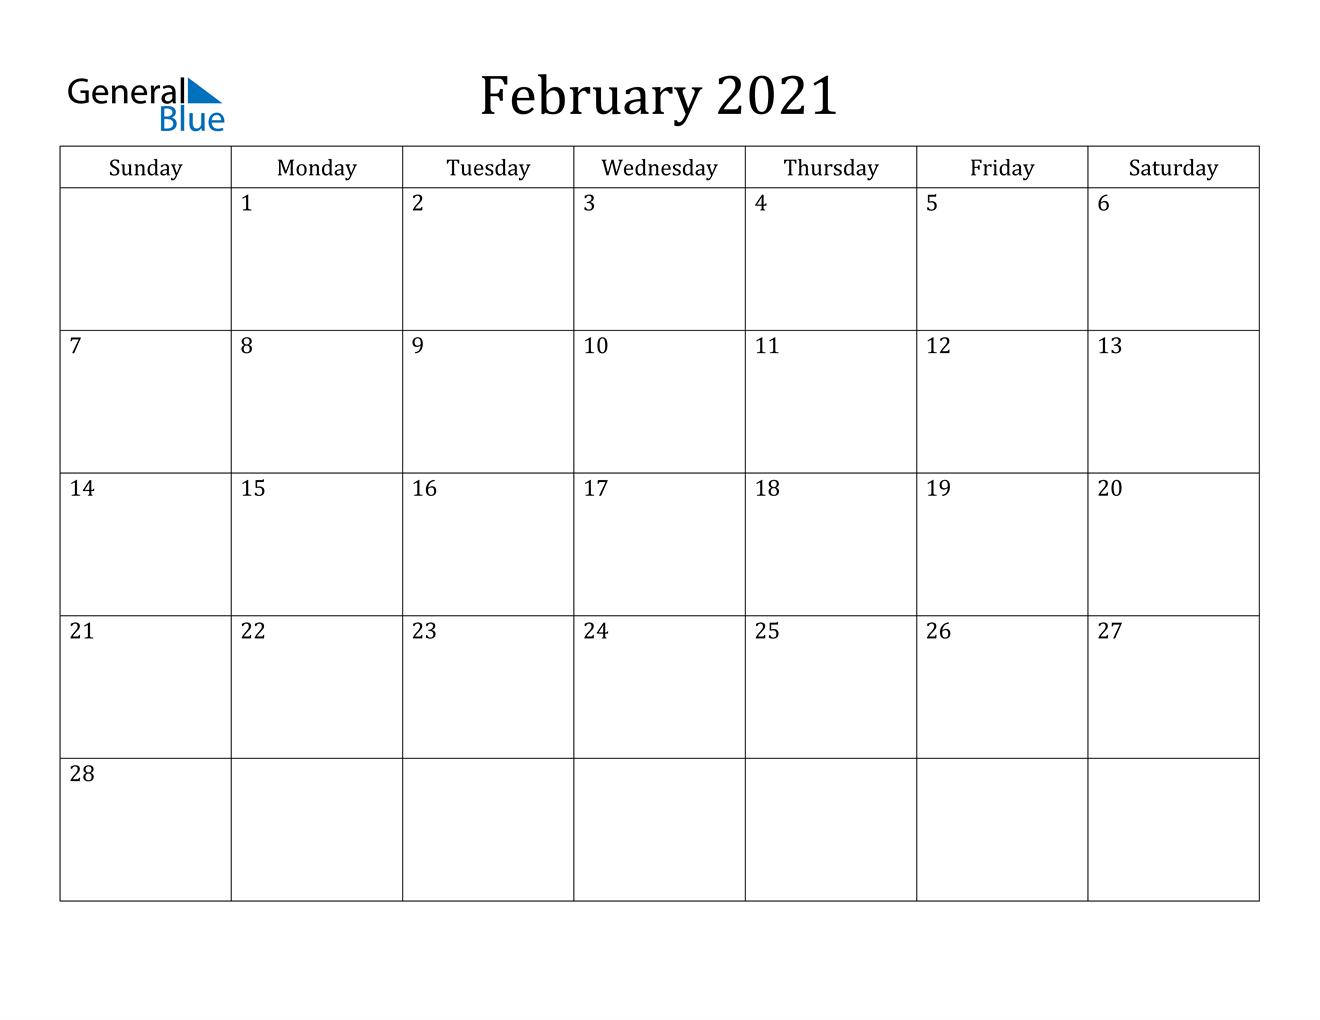 Images of Febraury 2021 Calendar